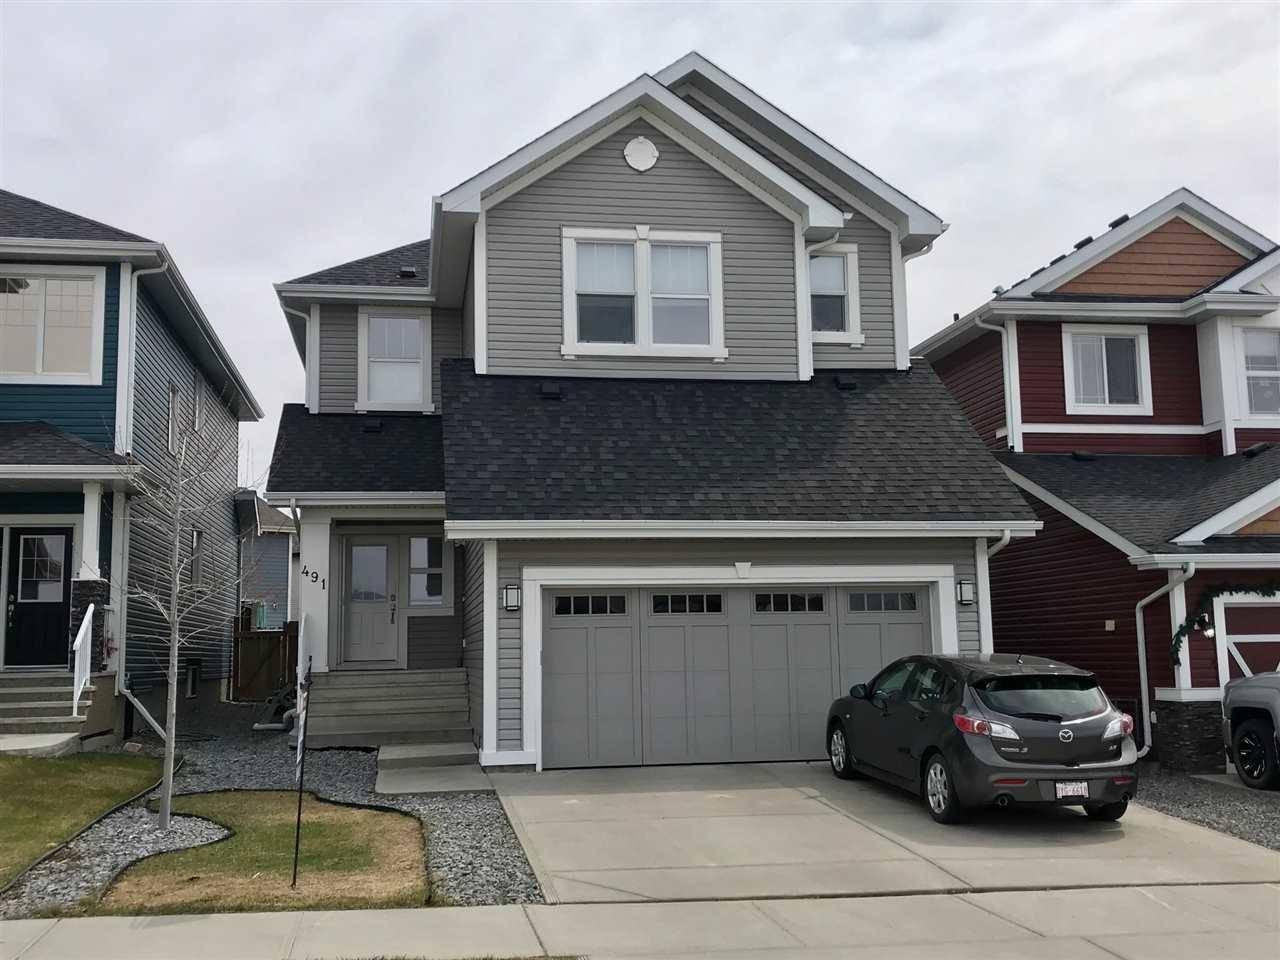 House for sale at 491 Sheppard Blvd Leduc Alberta - MLS: E4186381